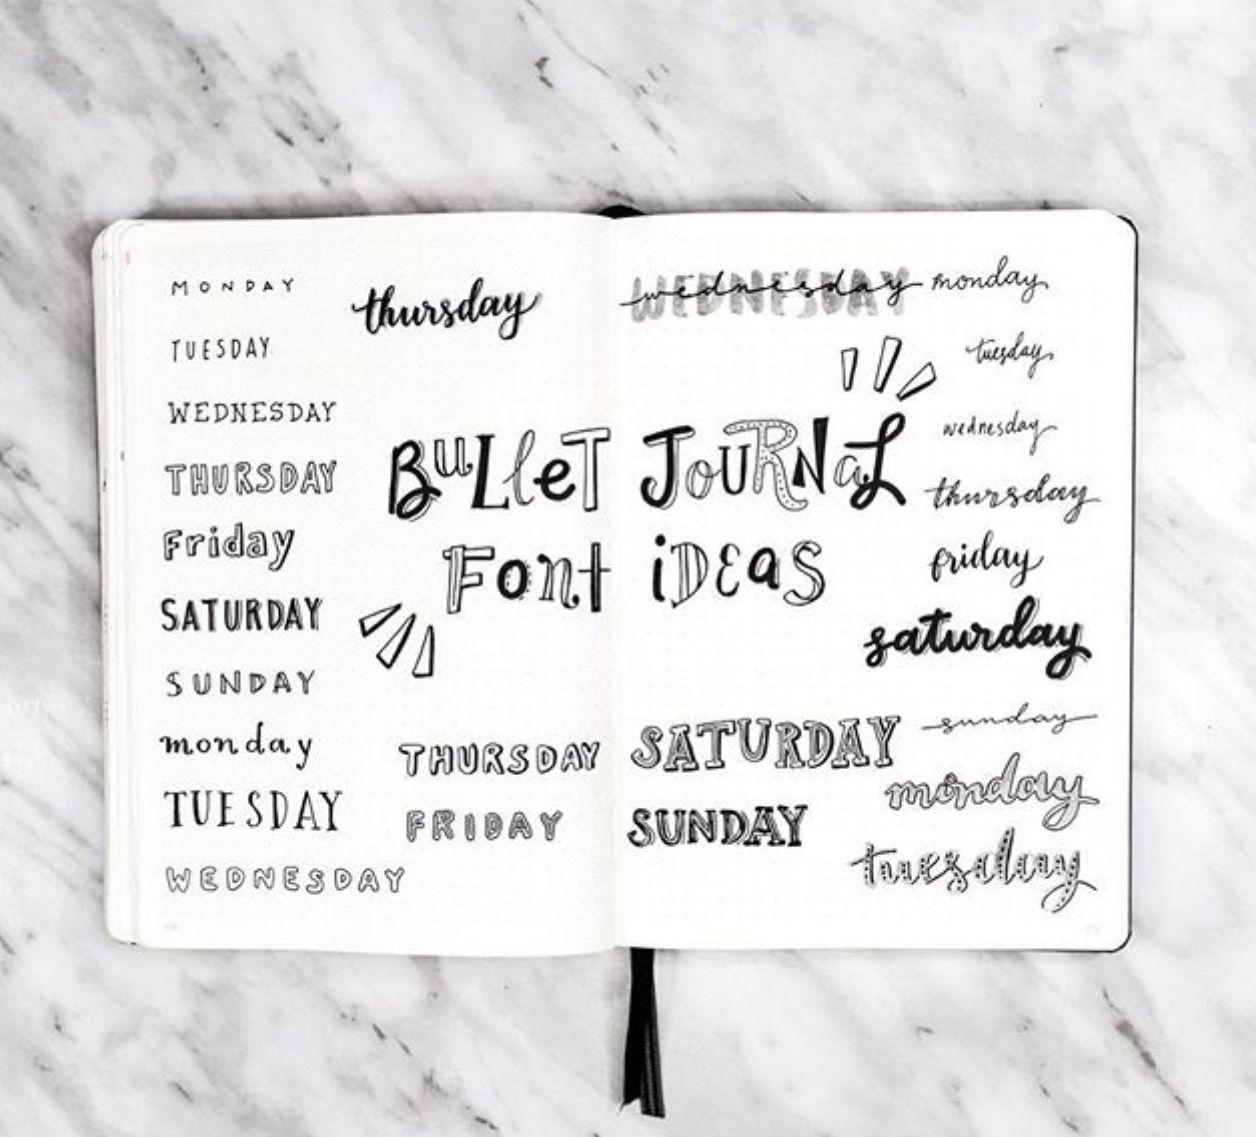 Bulletjournal font ideas by @amandarachlee #bulletjournal